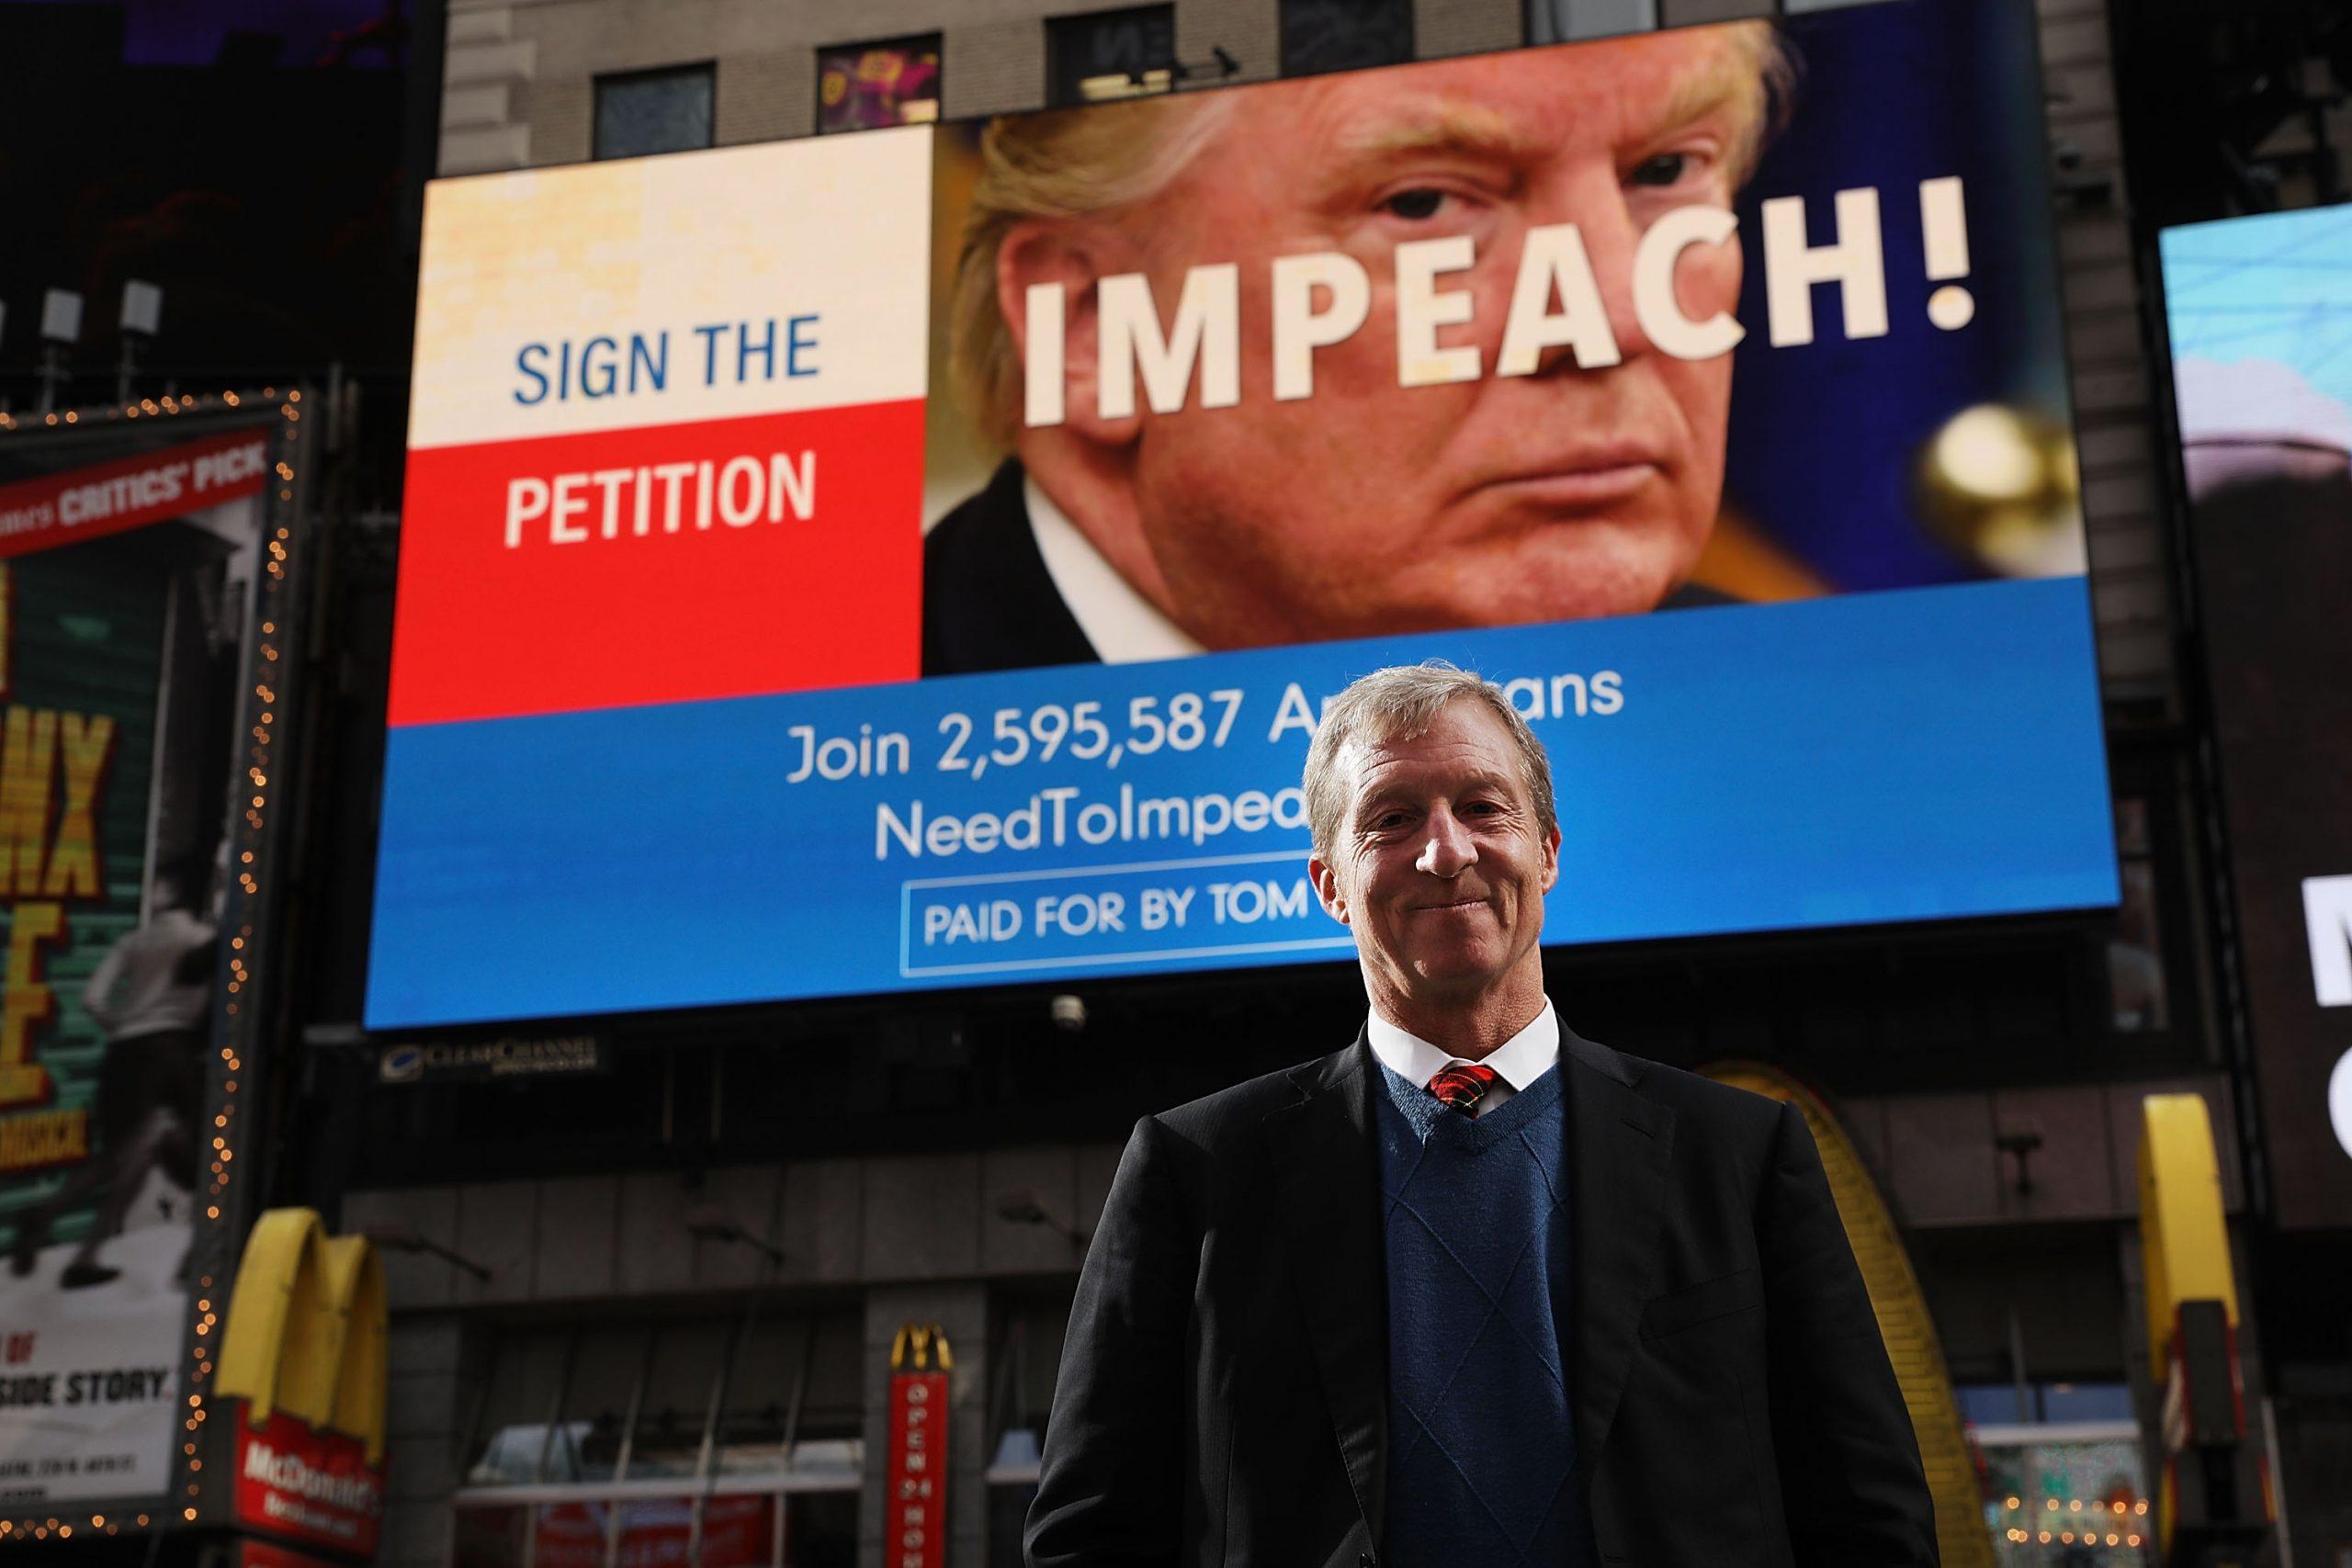 Trump, Steyer Talk Impeachment in Ads